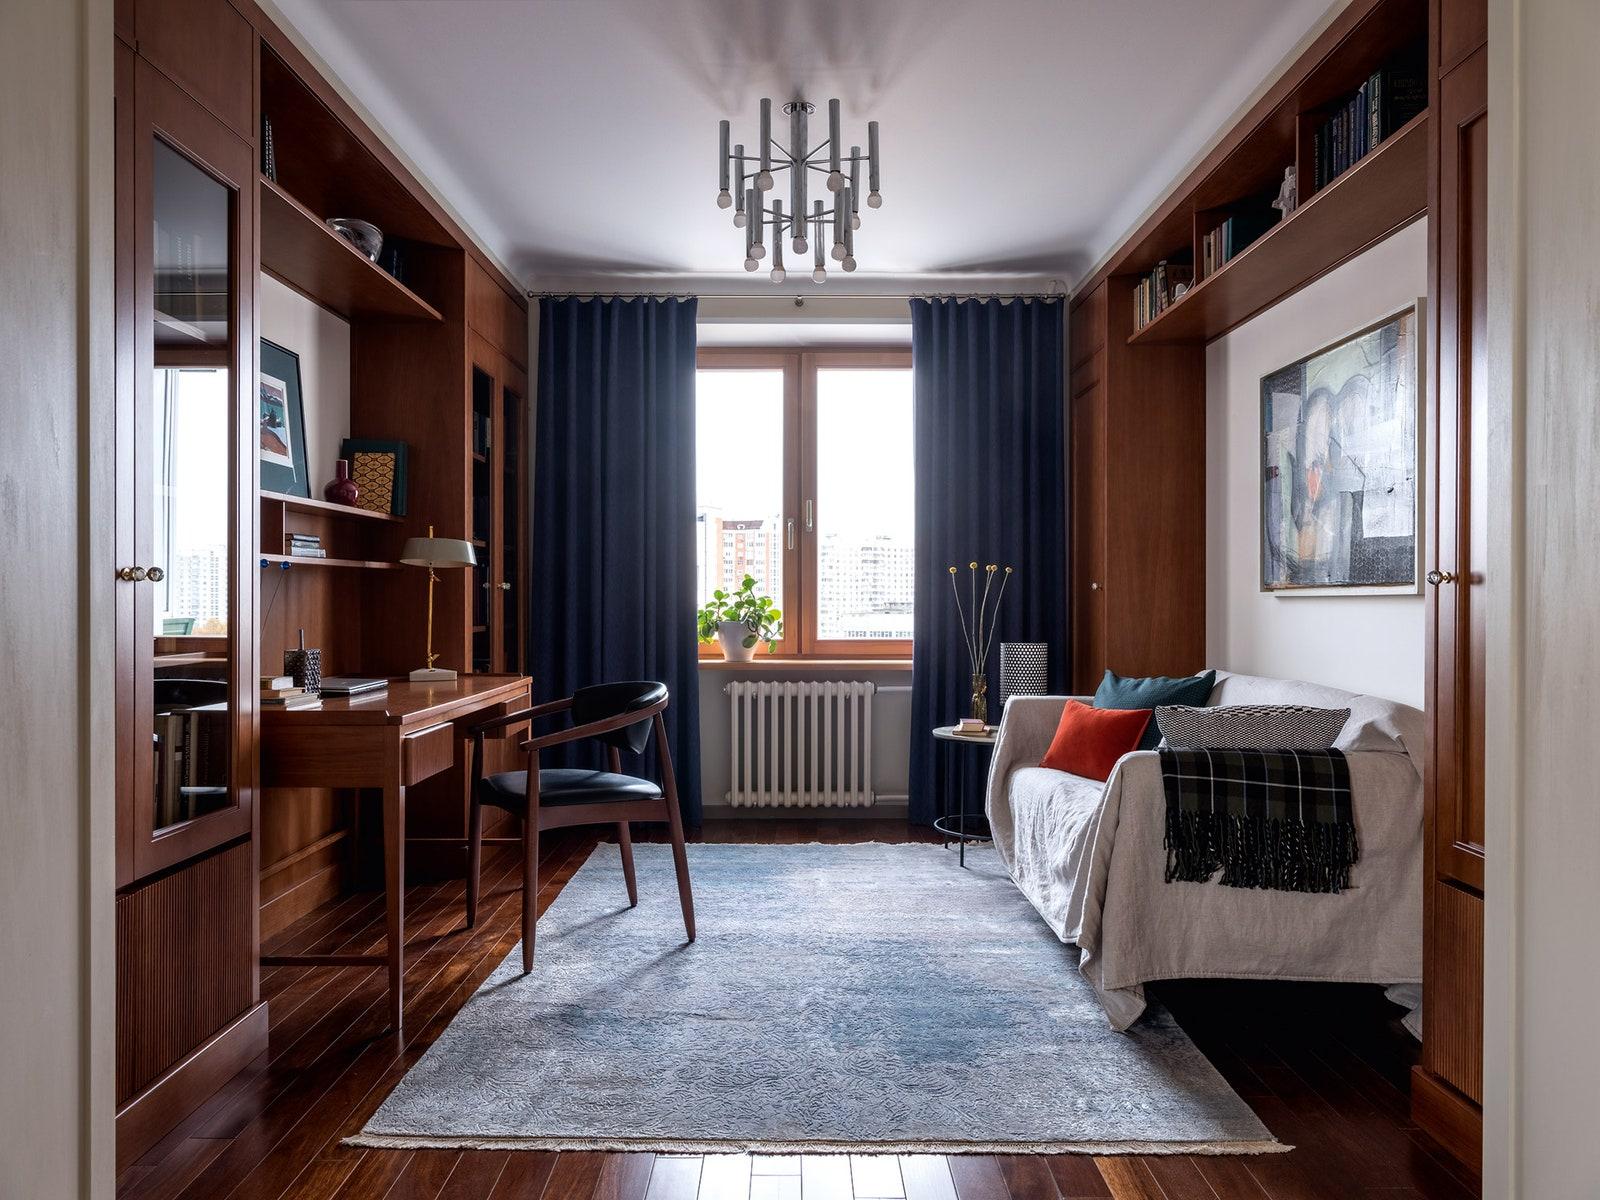 .       Stillux 1950    20th Century Lamps  Interior Design Collection             ANSY Carpet Company     Viva Vintage...